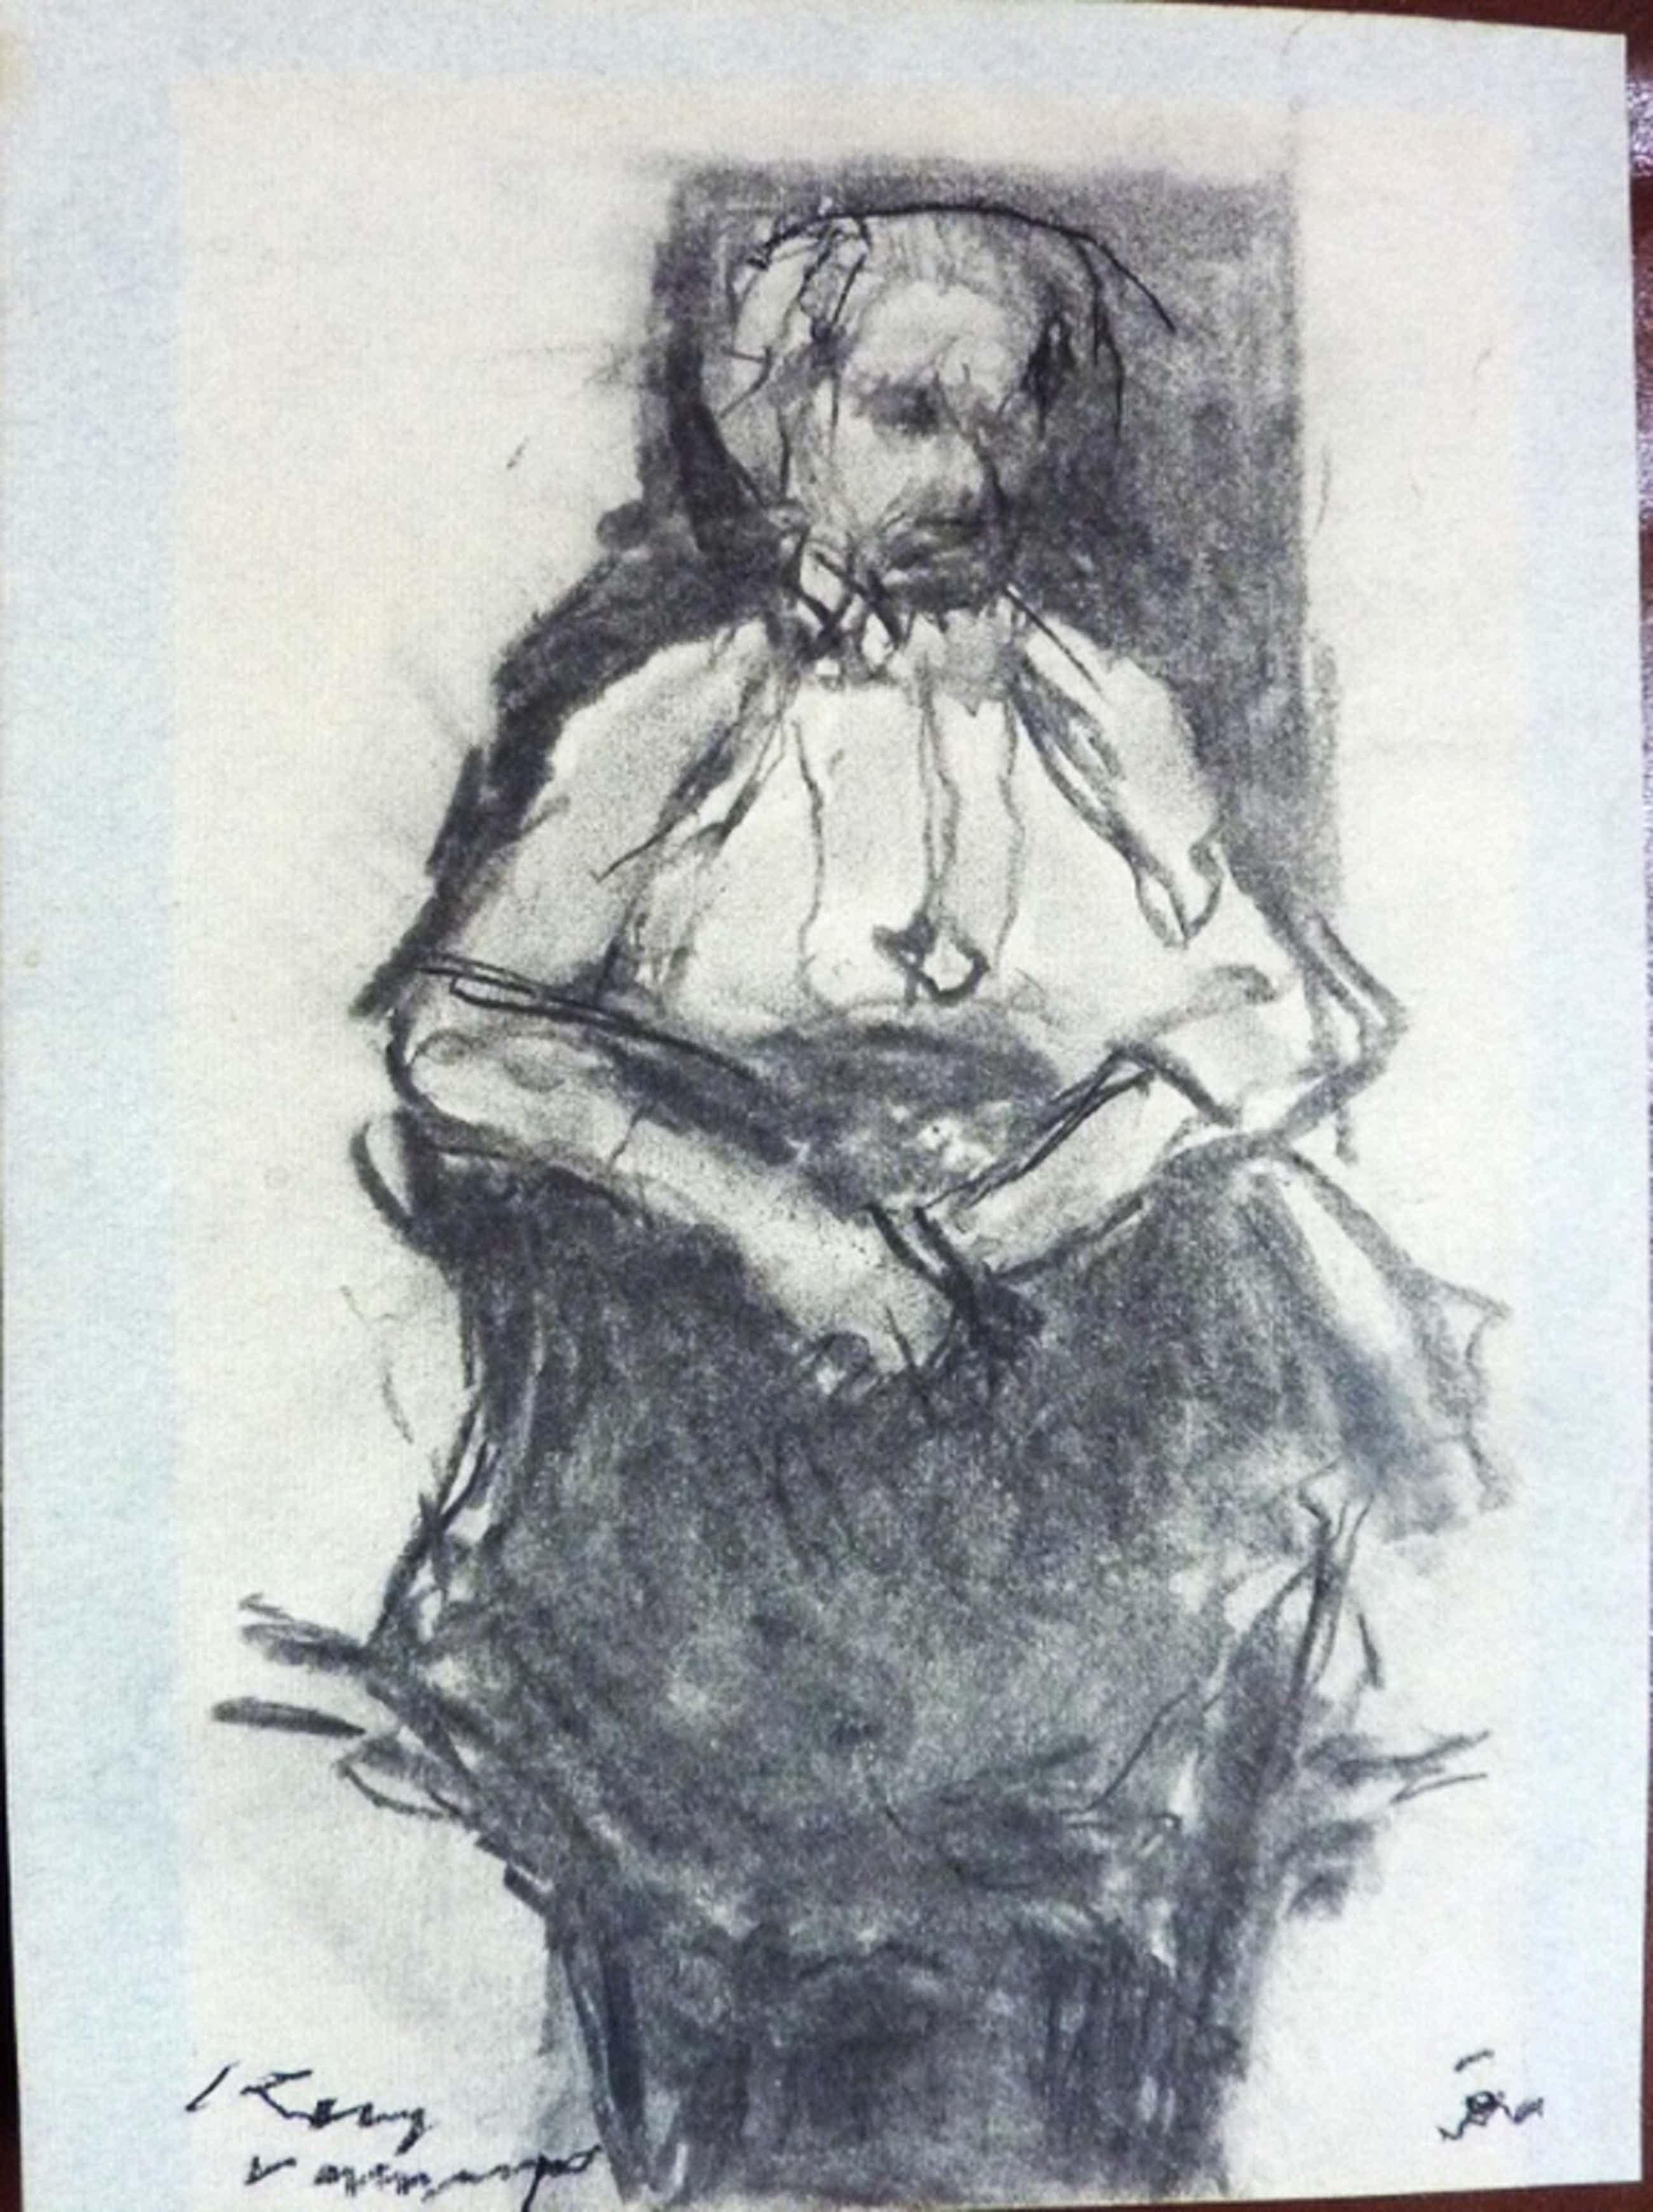 KEES VERWEY tekening Charlotte van Pallandt 1990 kopen? Bied vanaf 95!